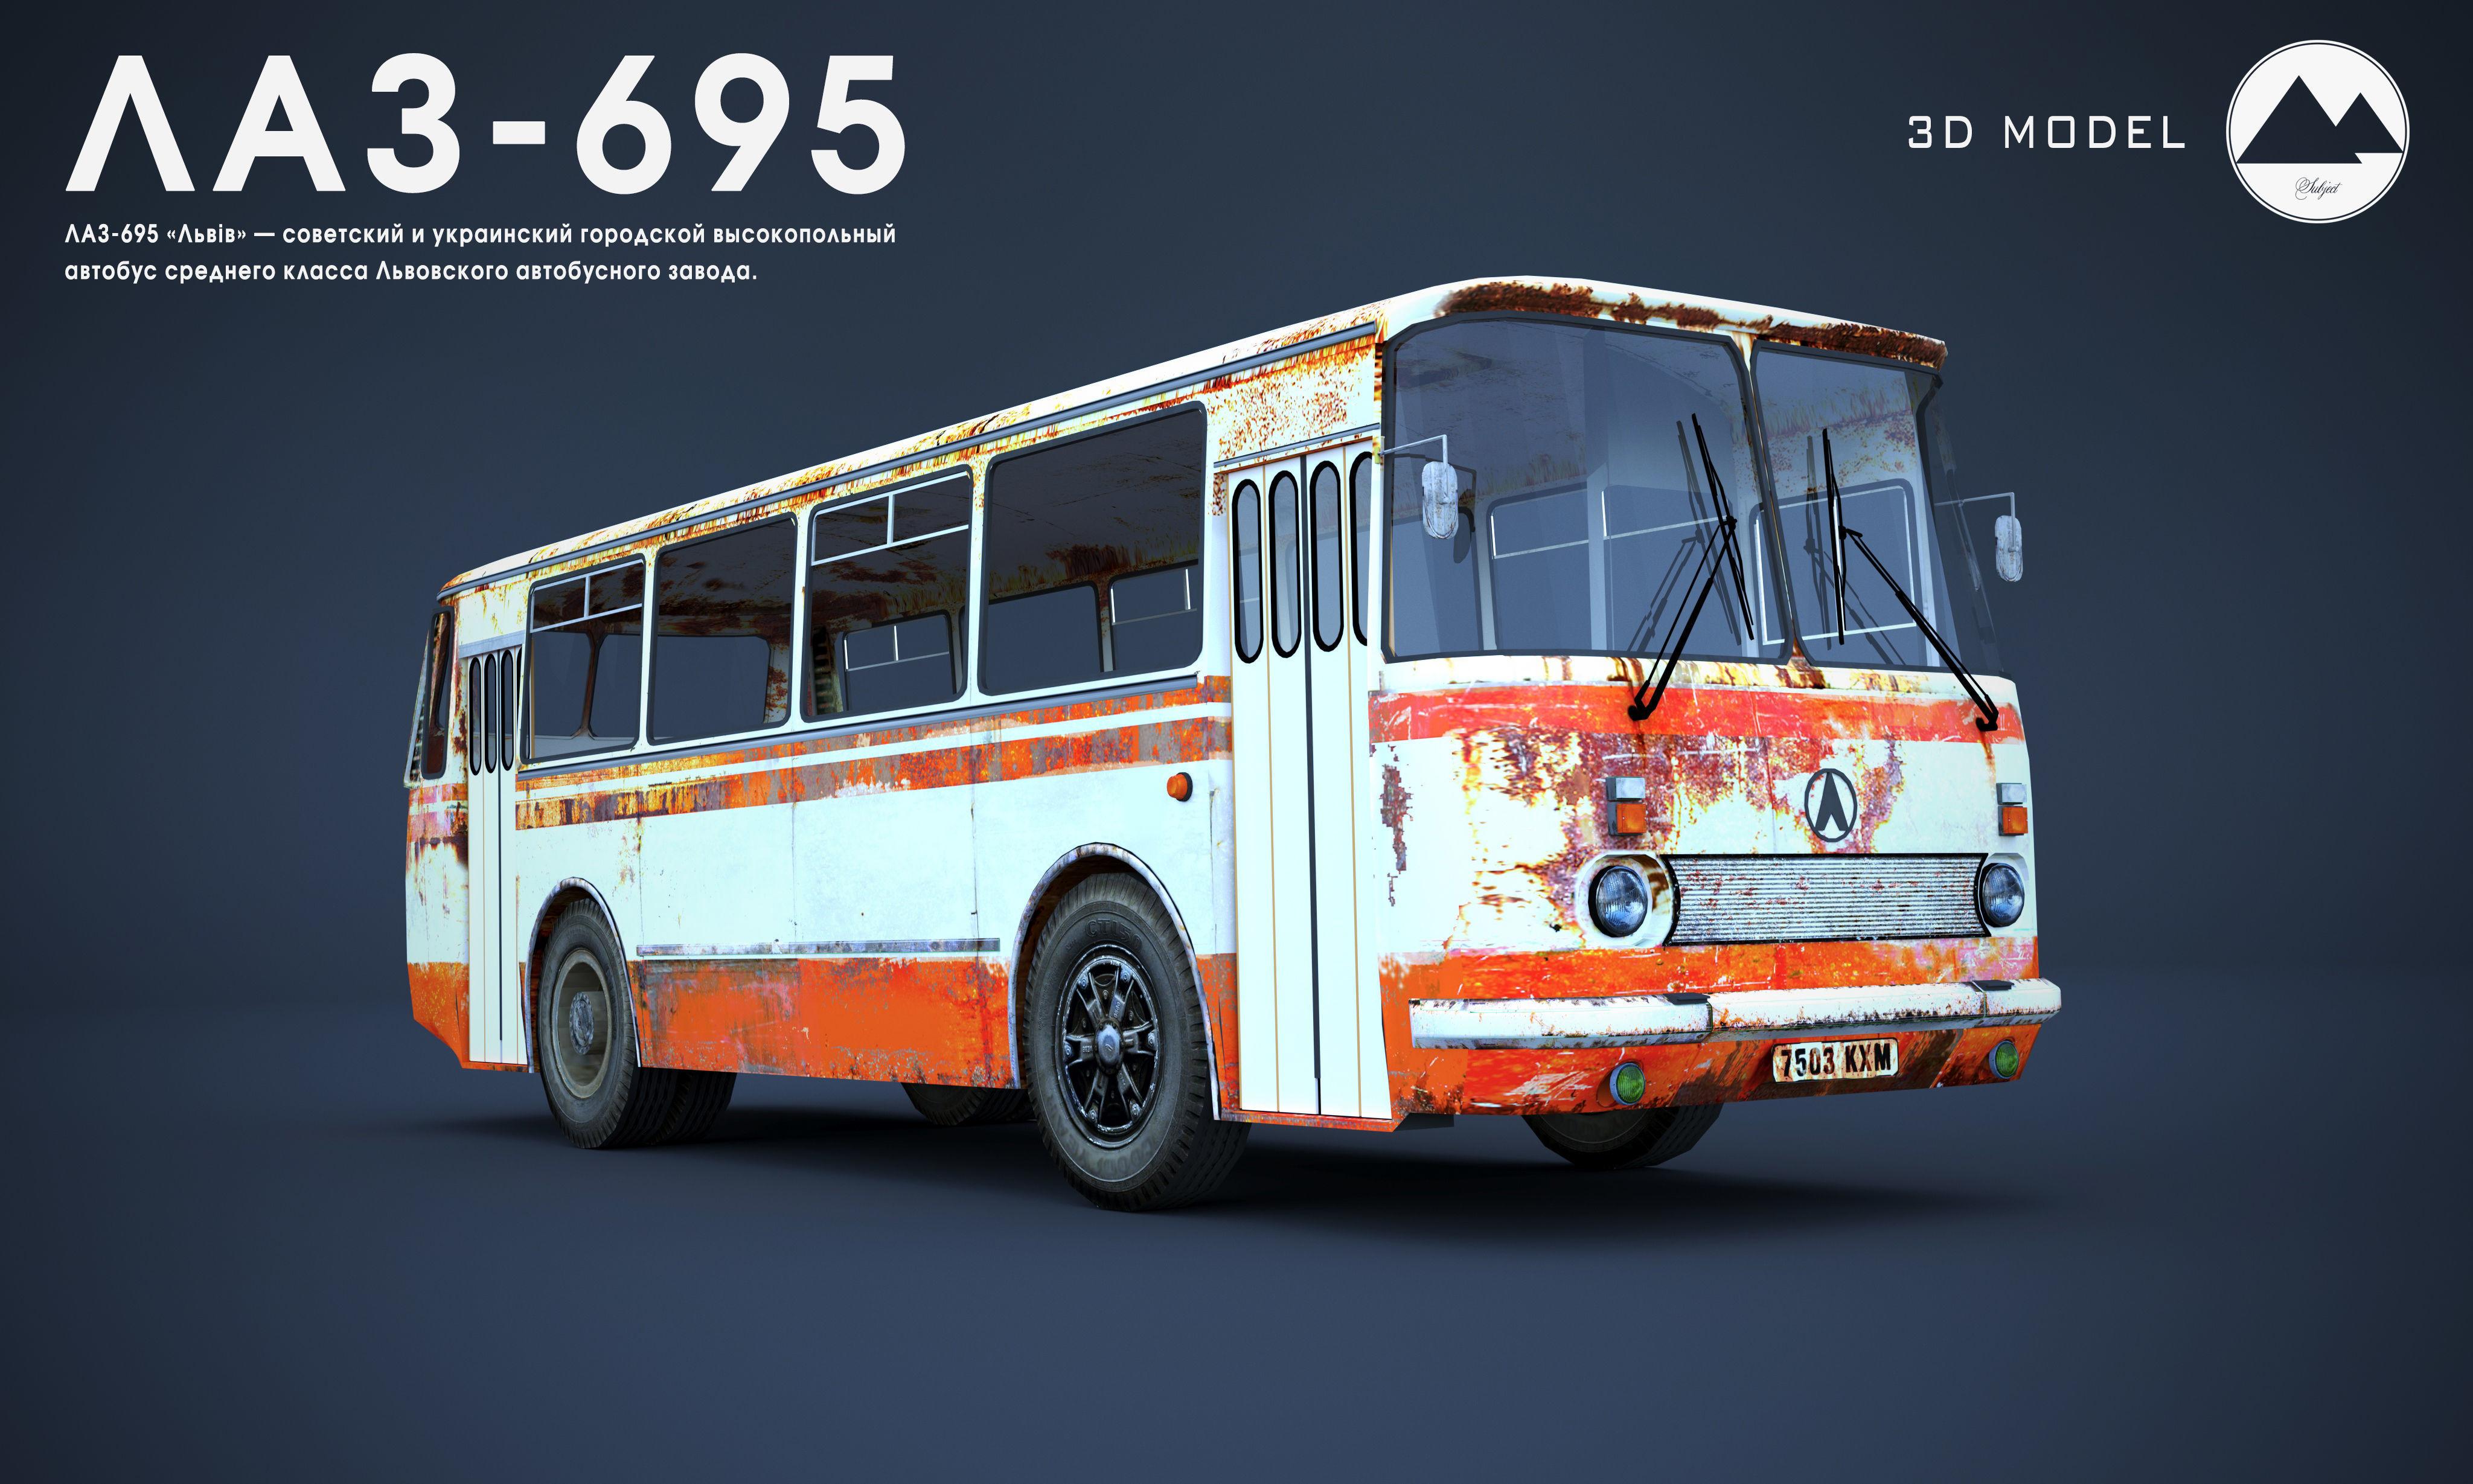 Old rusty city bus LAZ 695 low-polygon 3D model